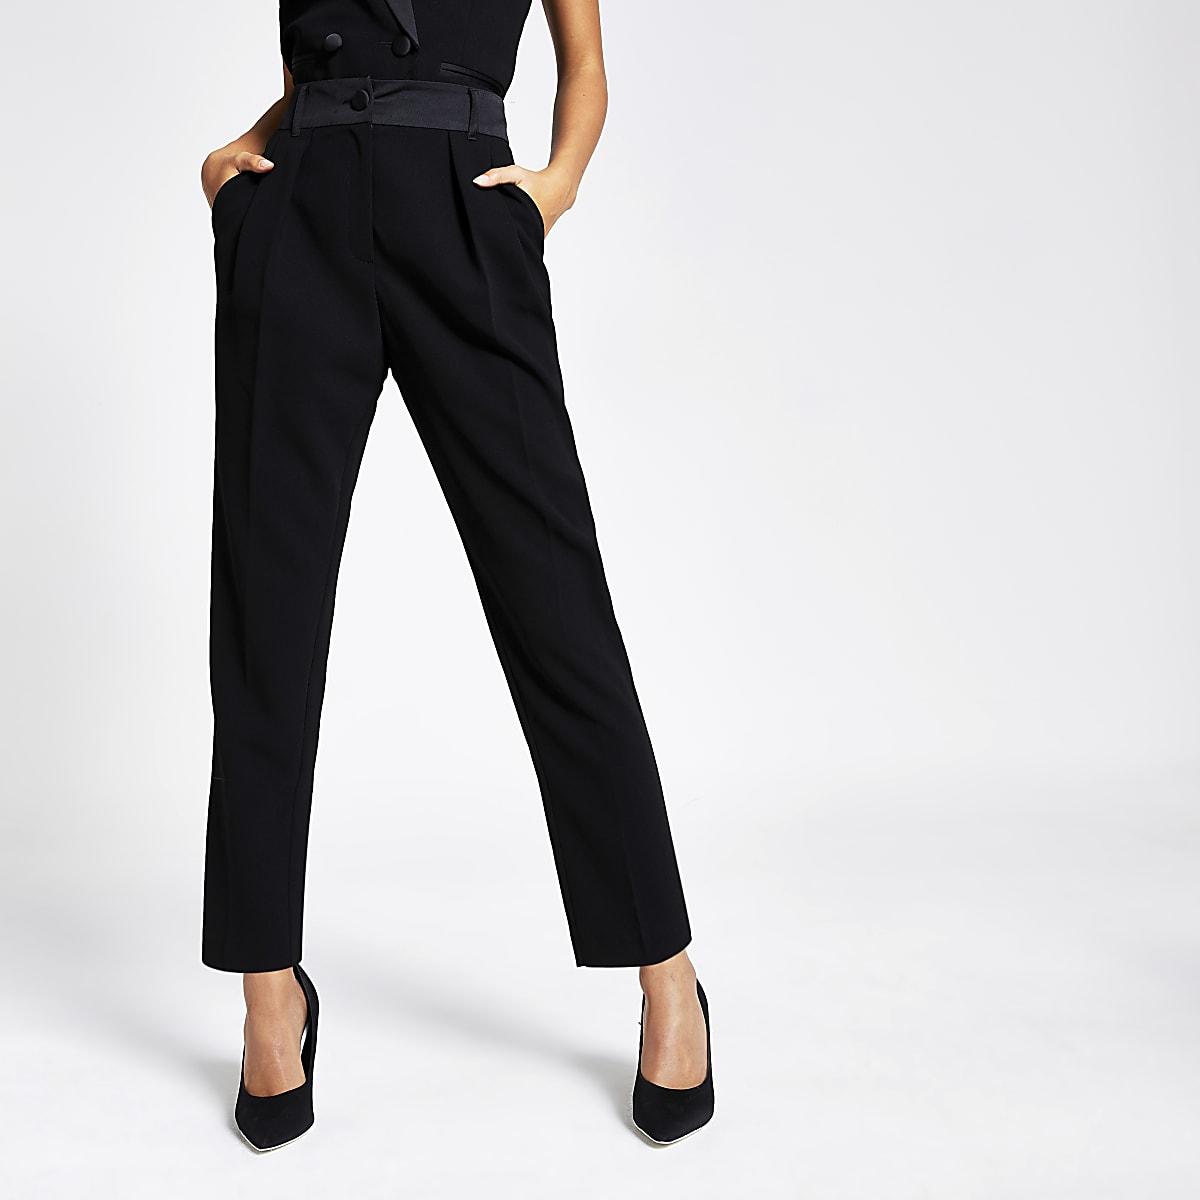 Black tux high waisted peg trousers